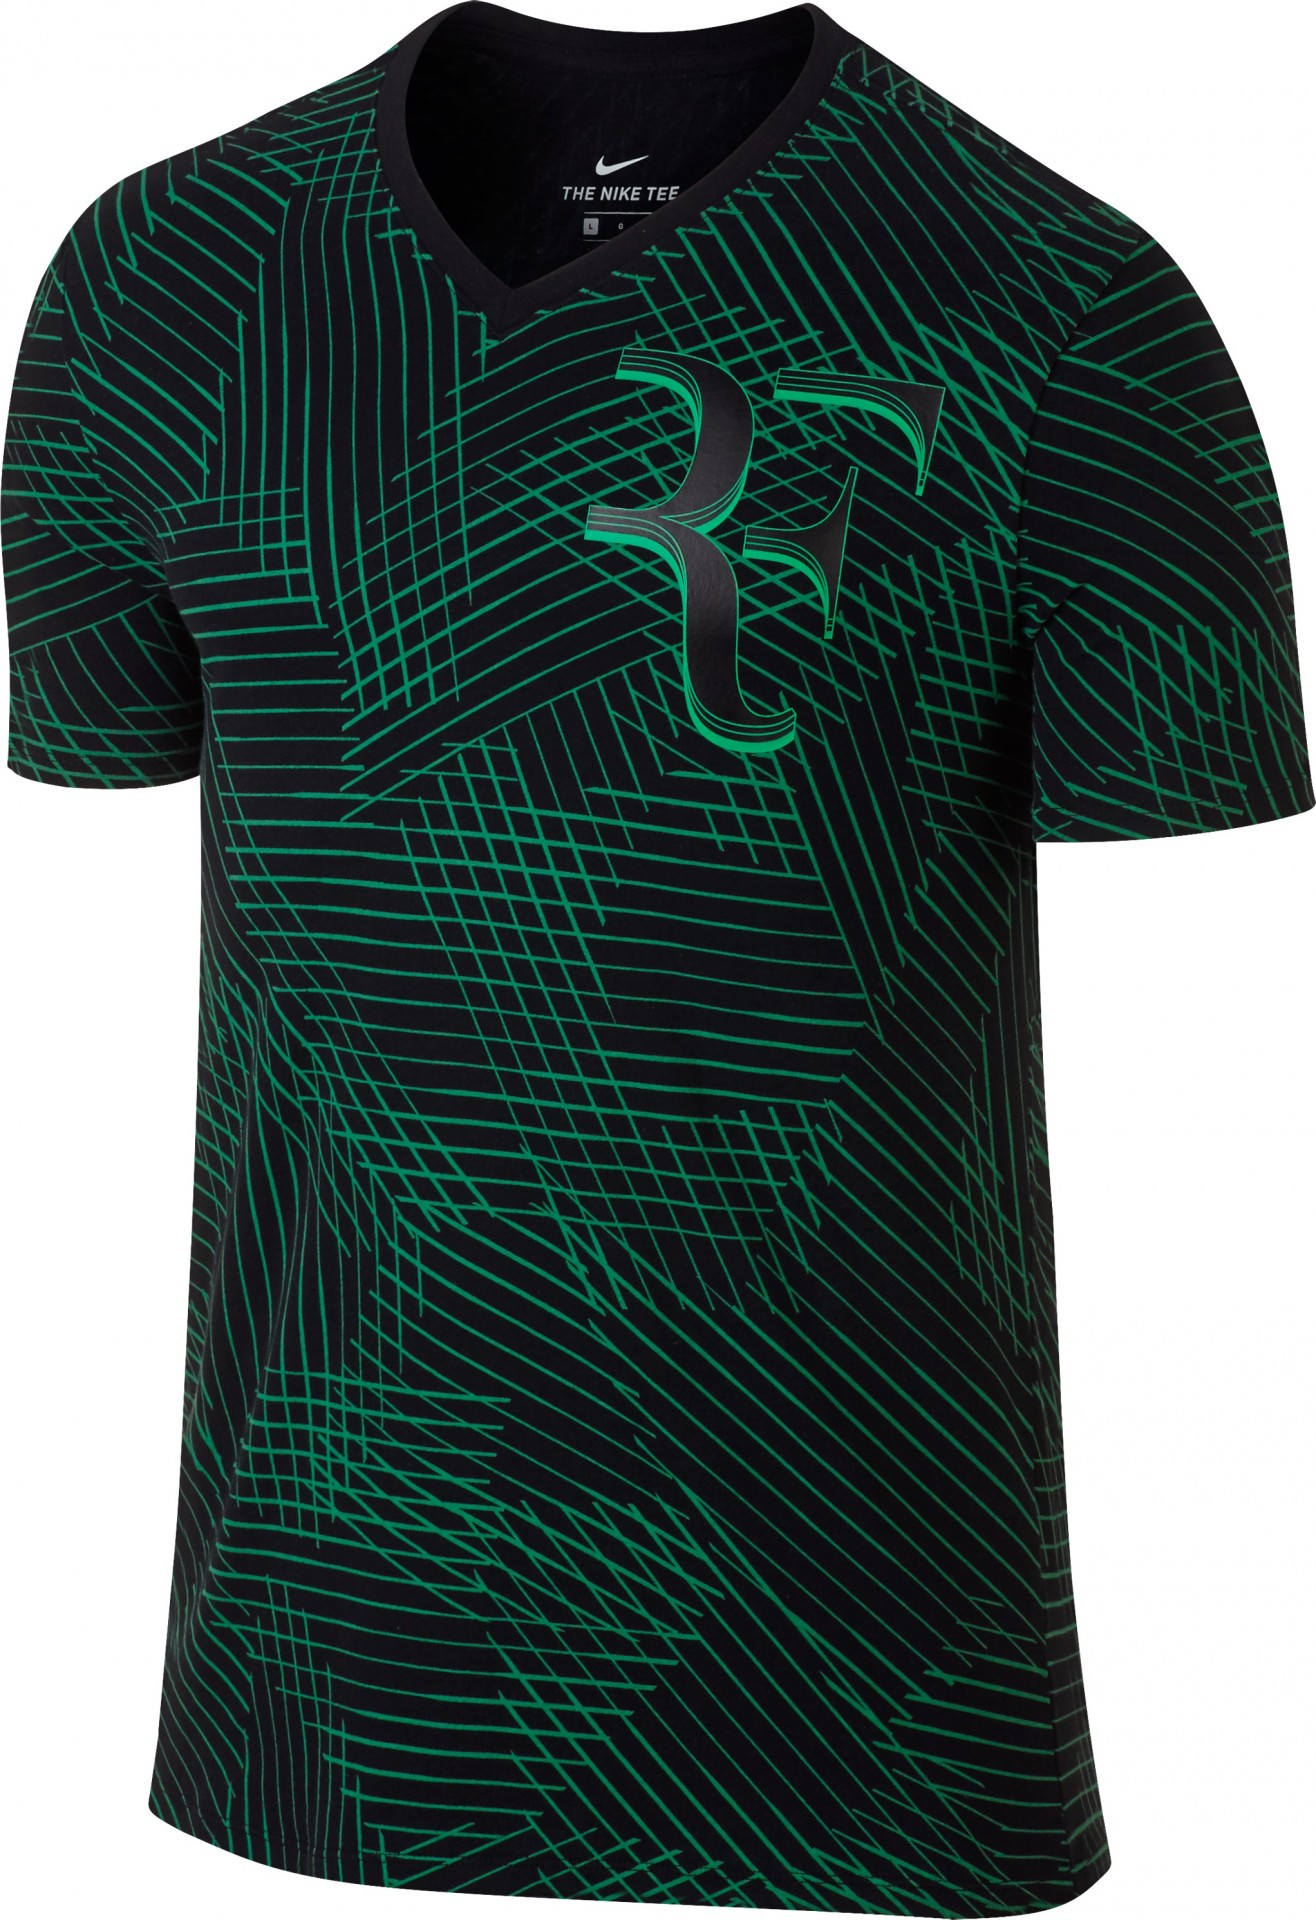 8b2fba149ff5 Tenisové tričko Nike Court Roger Federer 831466-010 černo-zelené